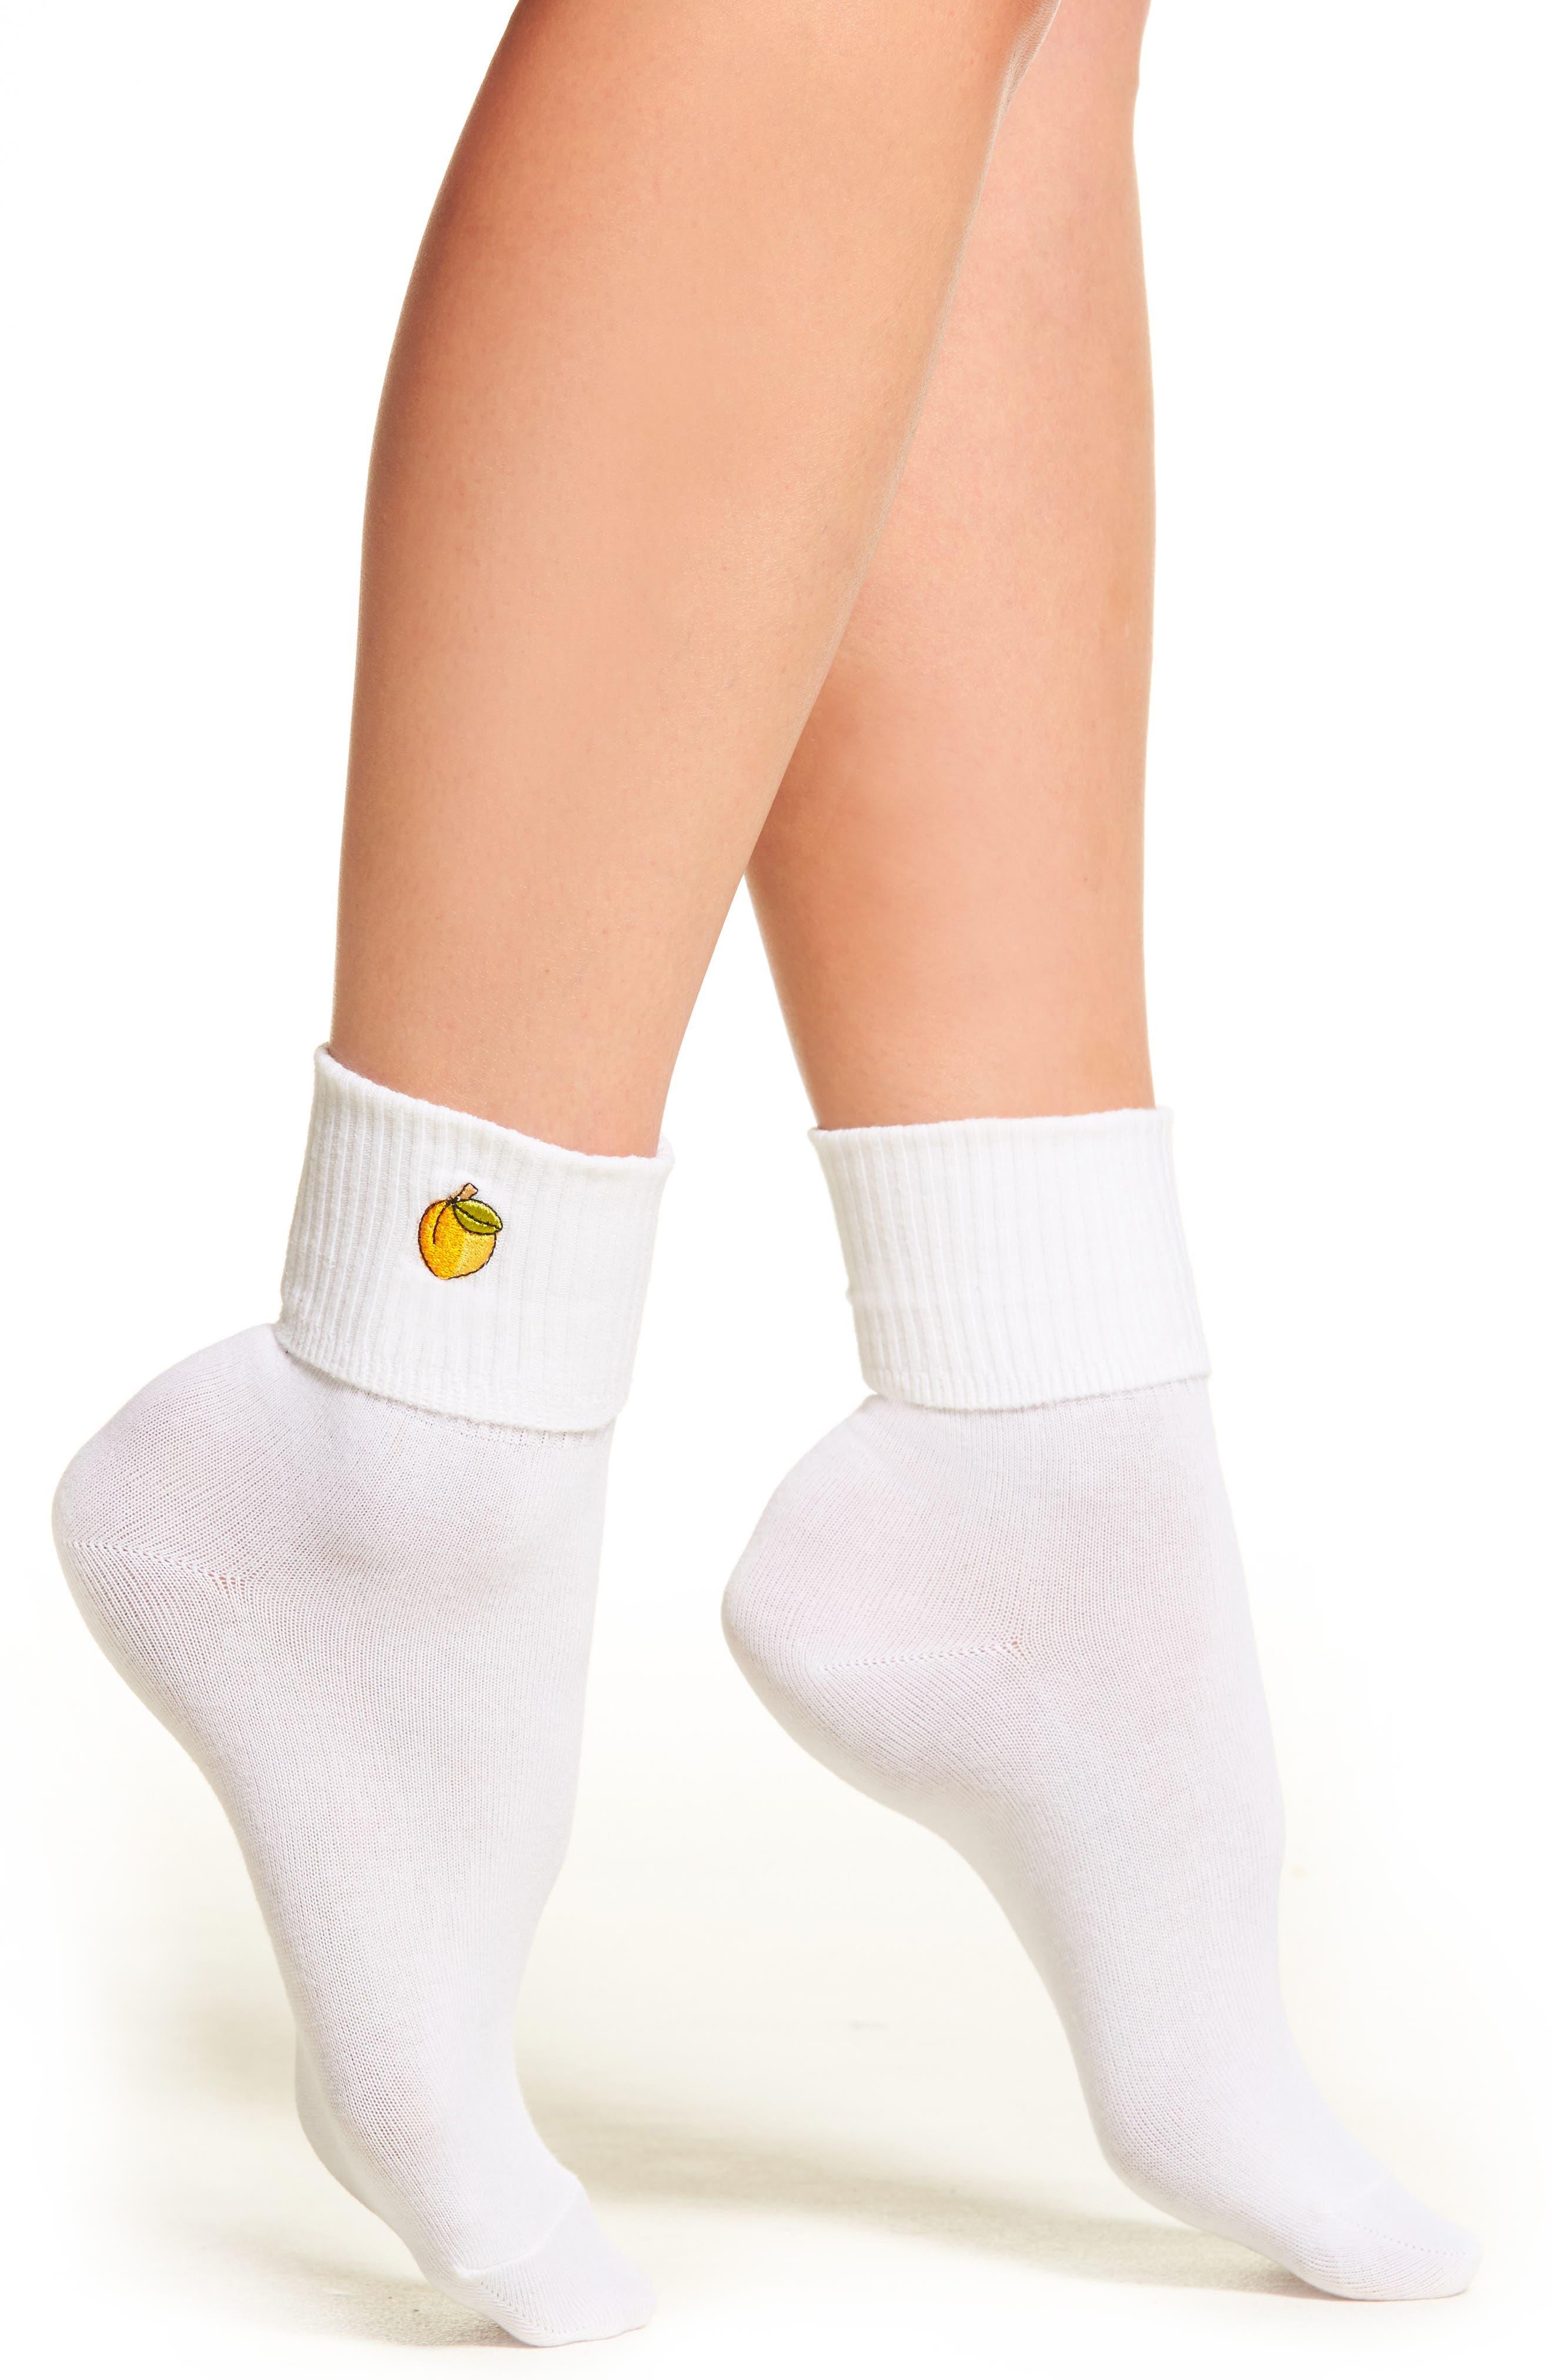 Peach Socks,                         Main,                         color, White/ Yellow